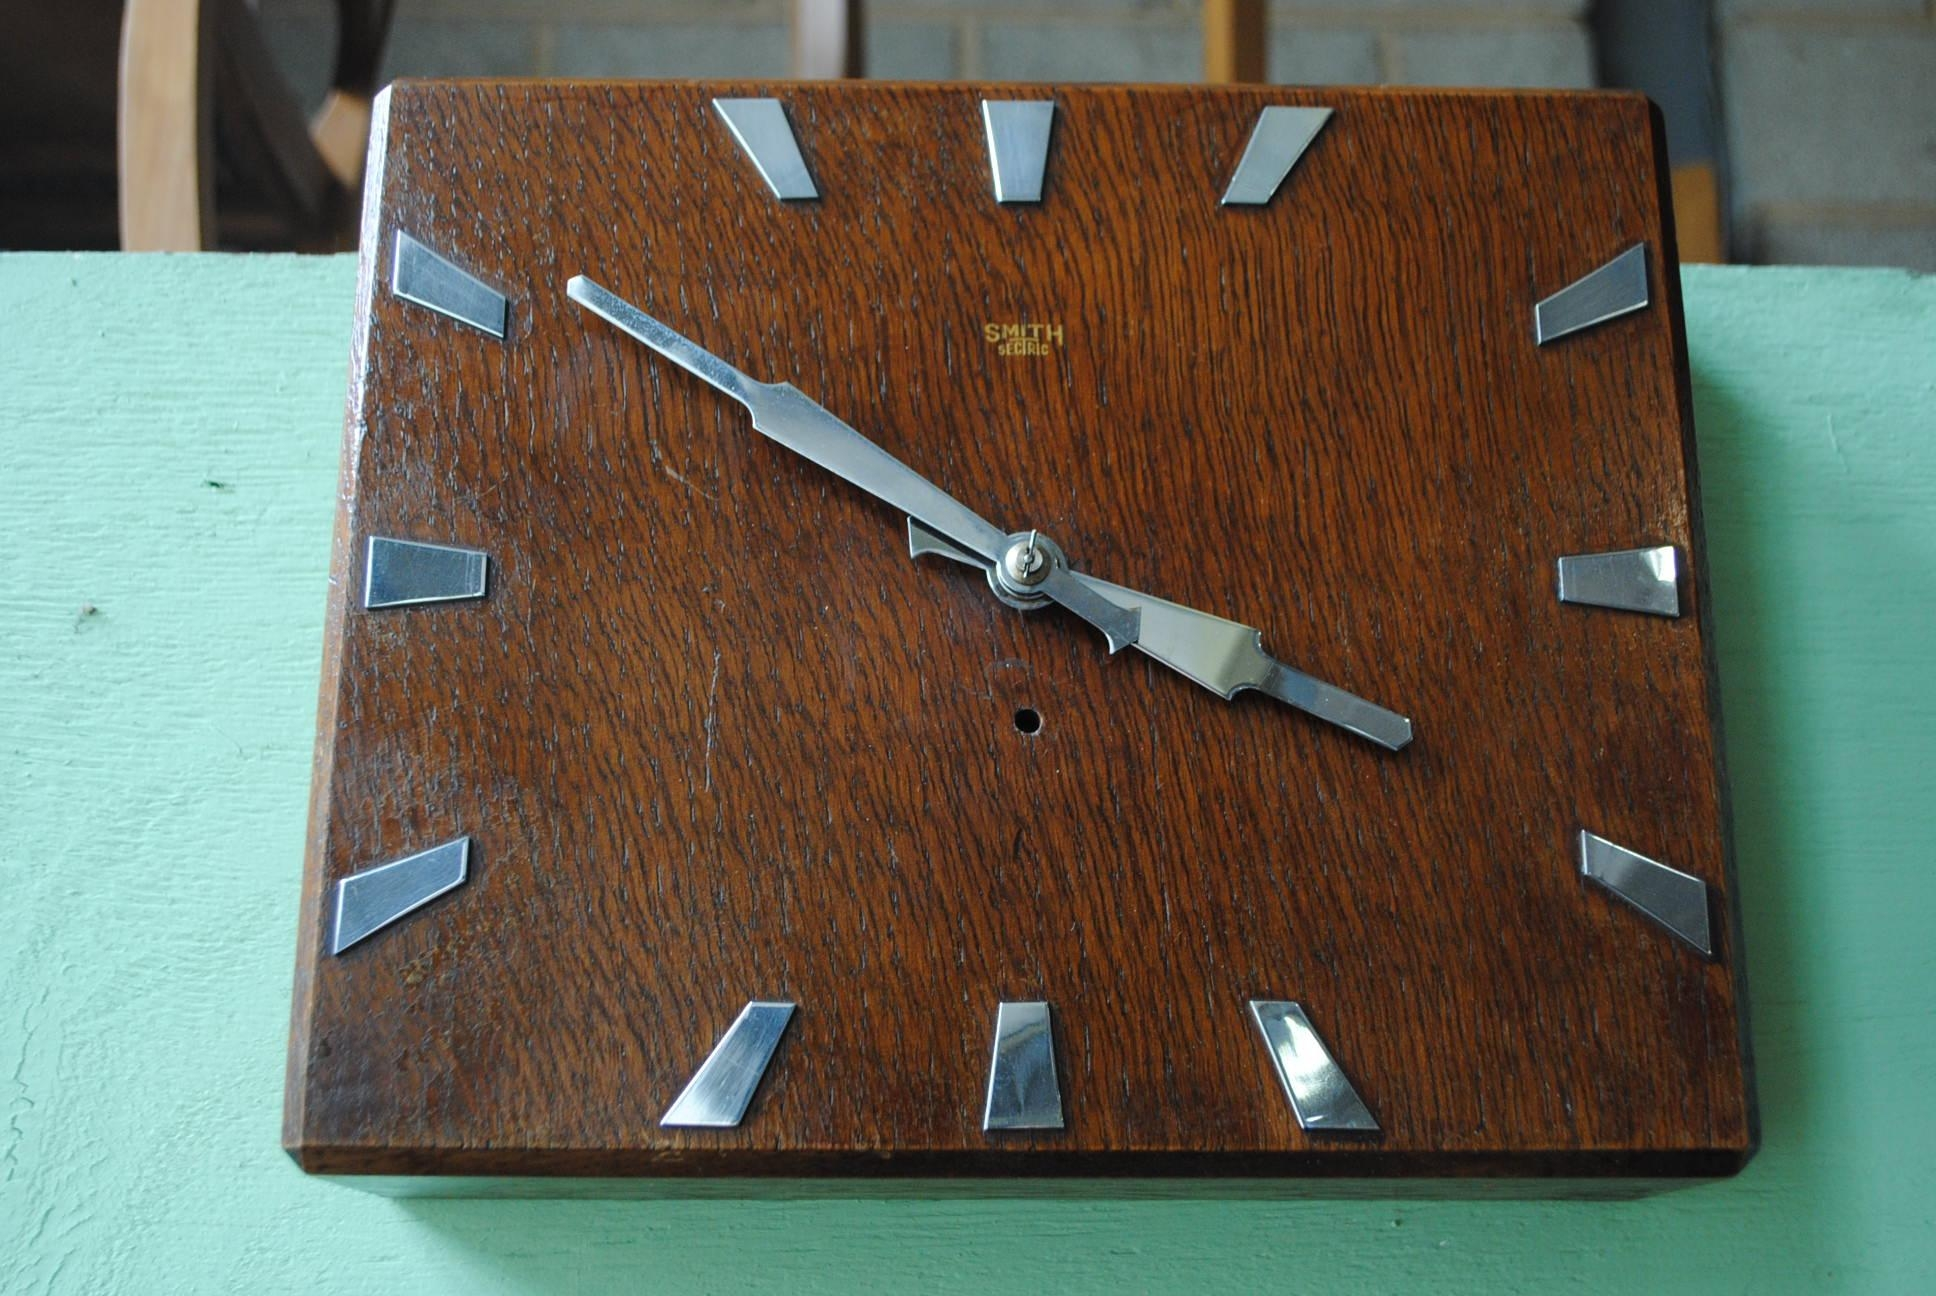 Art Deco Wall Clock || Cloud 9, Art Deco Furniture Sales Intended For Art Deco Wall Clocks (View 14 of 20)